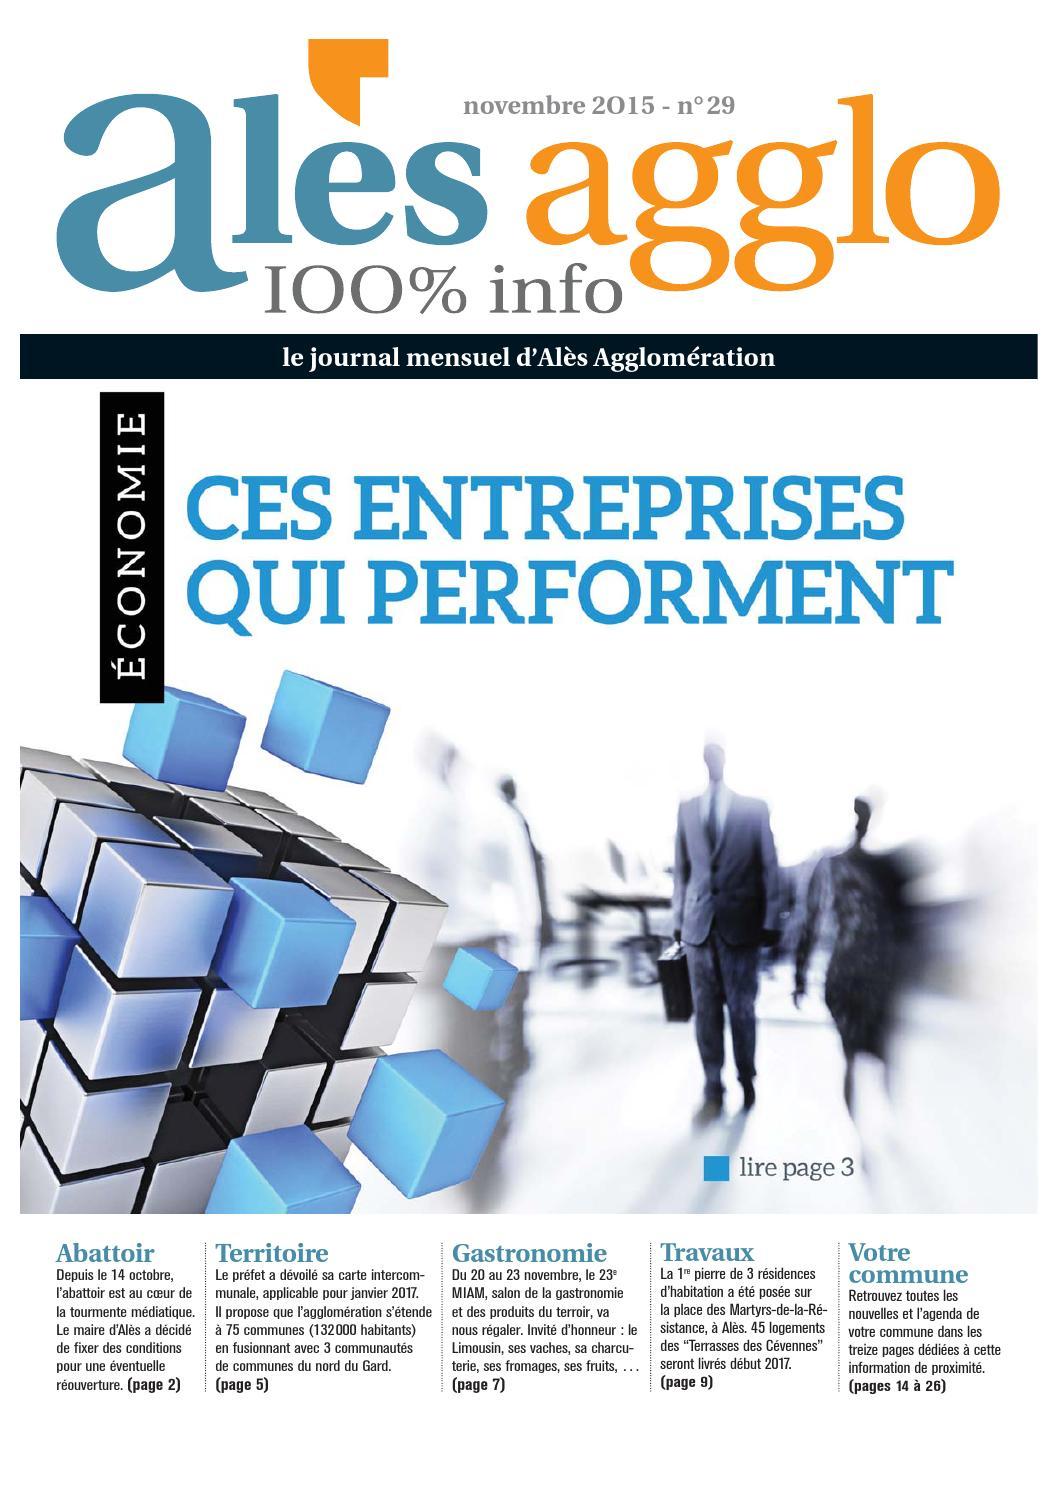 Alès Agglo n°29 - Novembre 2015 by Alès Agglomération - issuu 3ee49ee1aedc